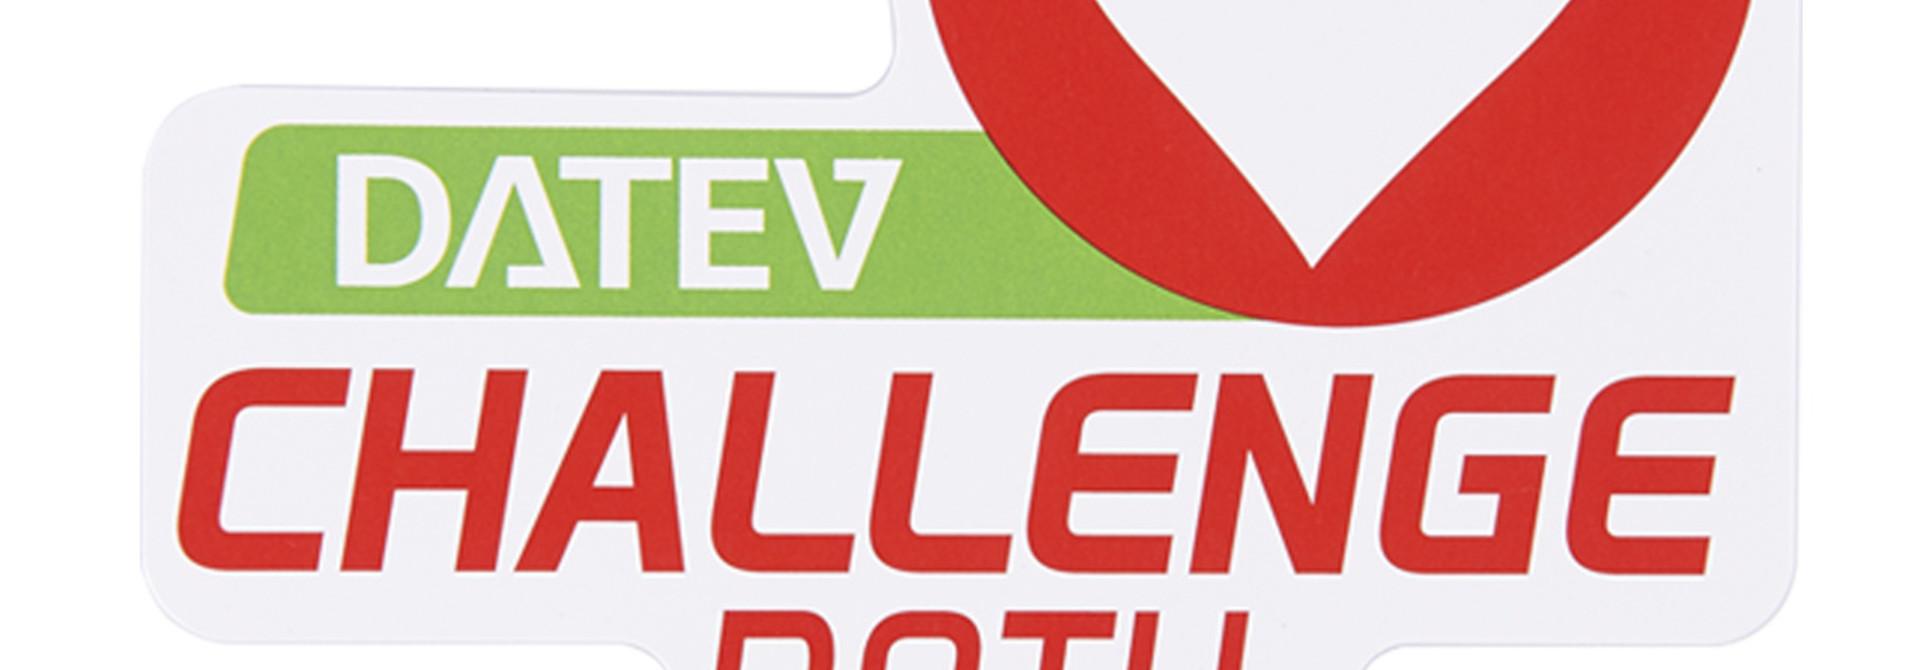 Sticker DATEV Challenge Roth powered by hep big